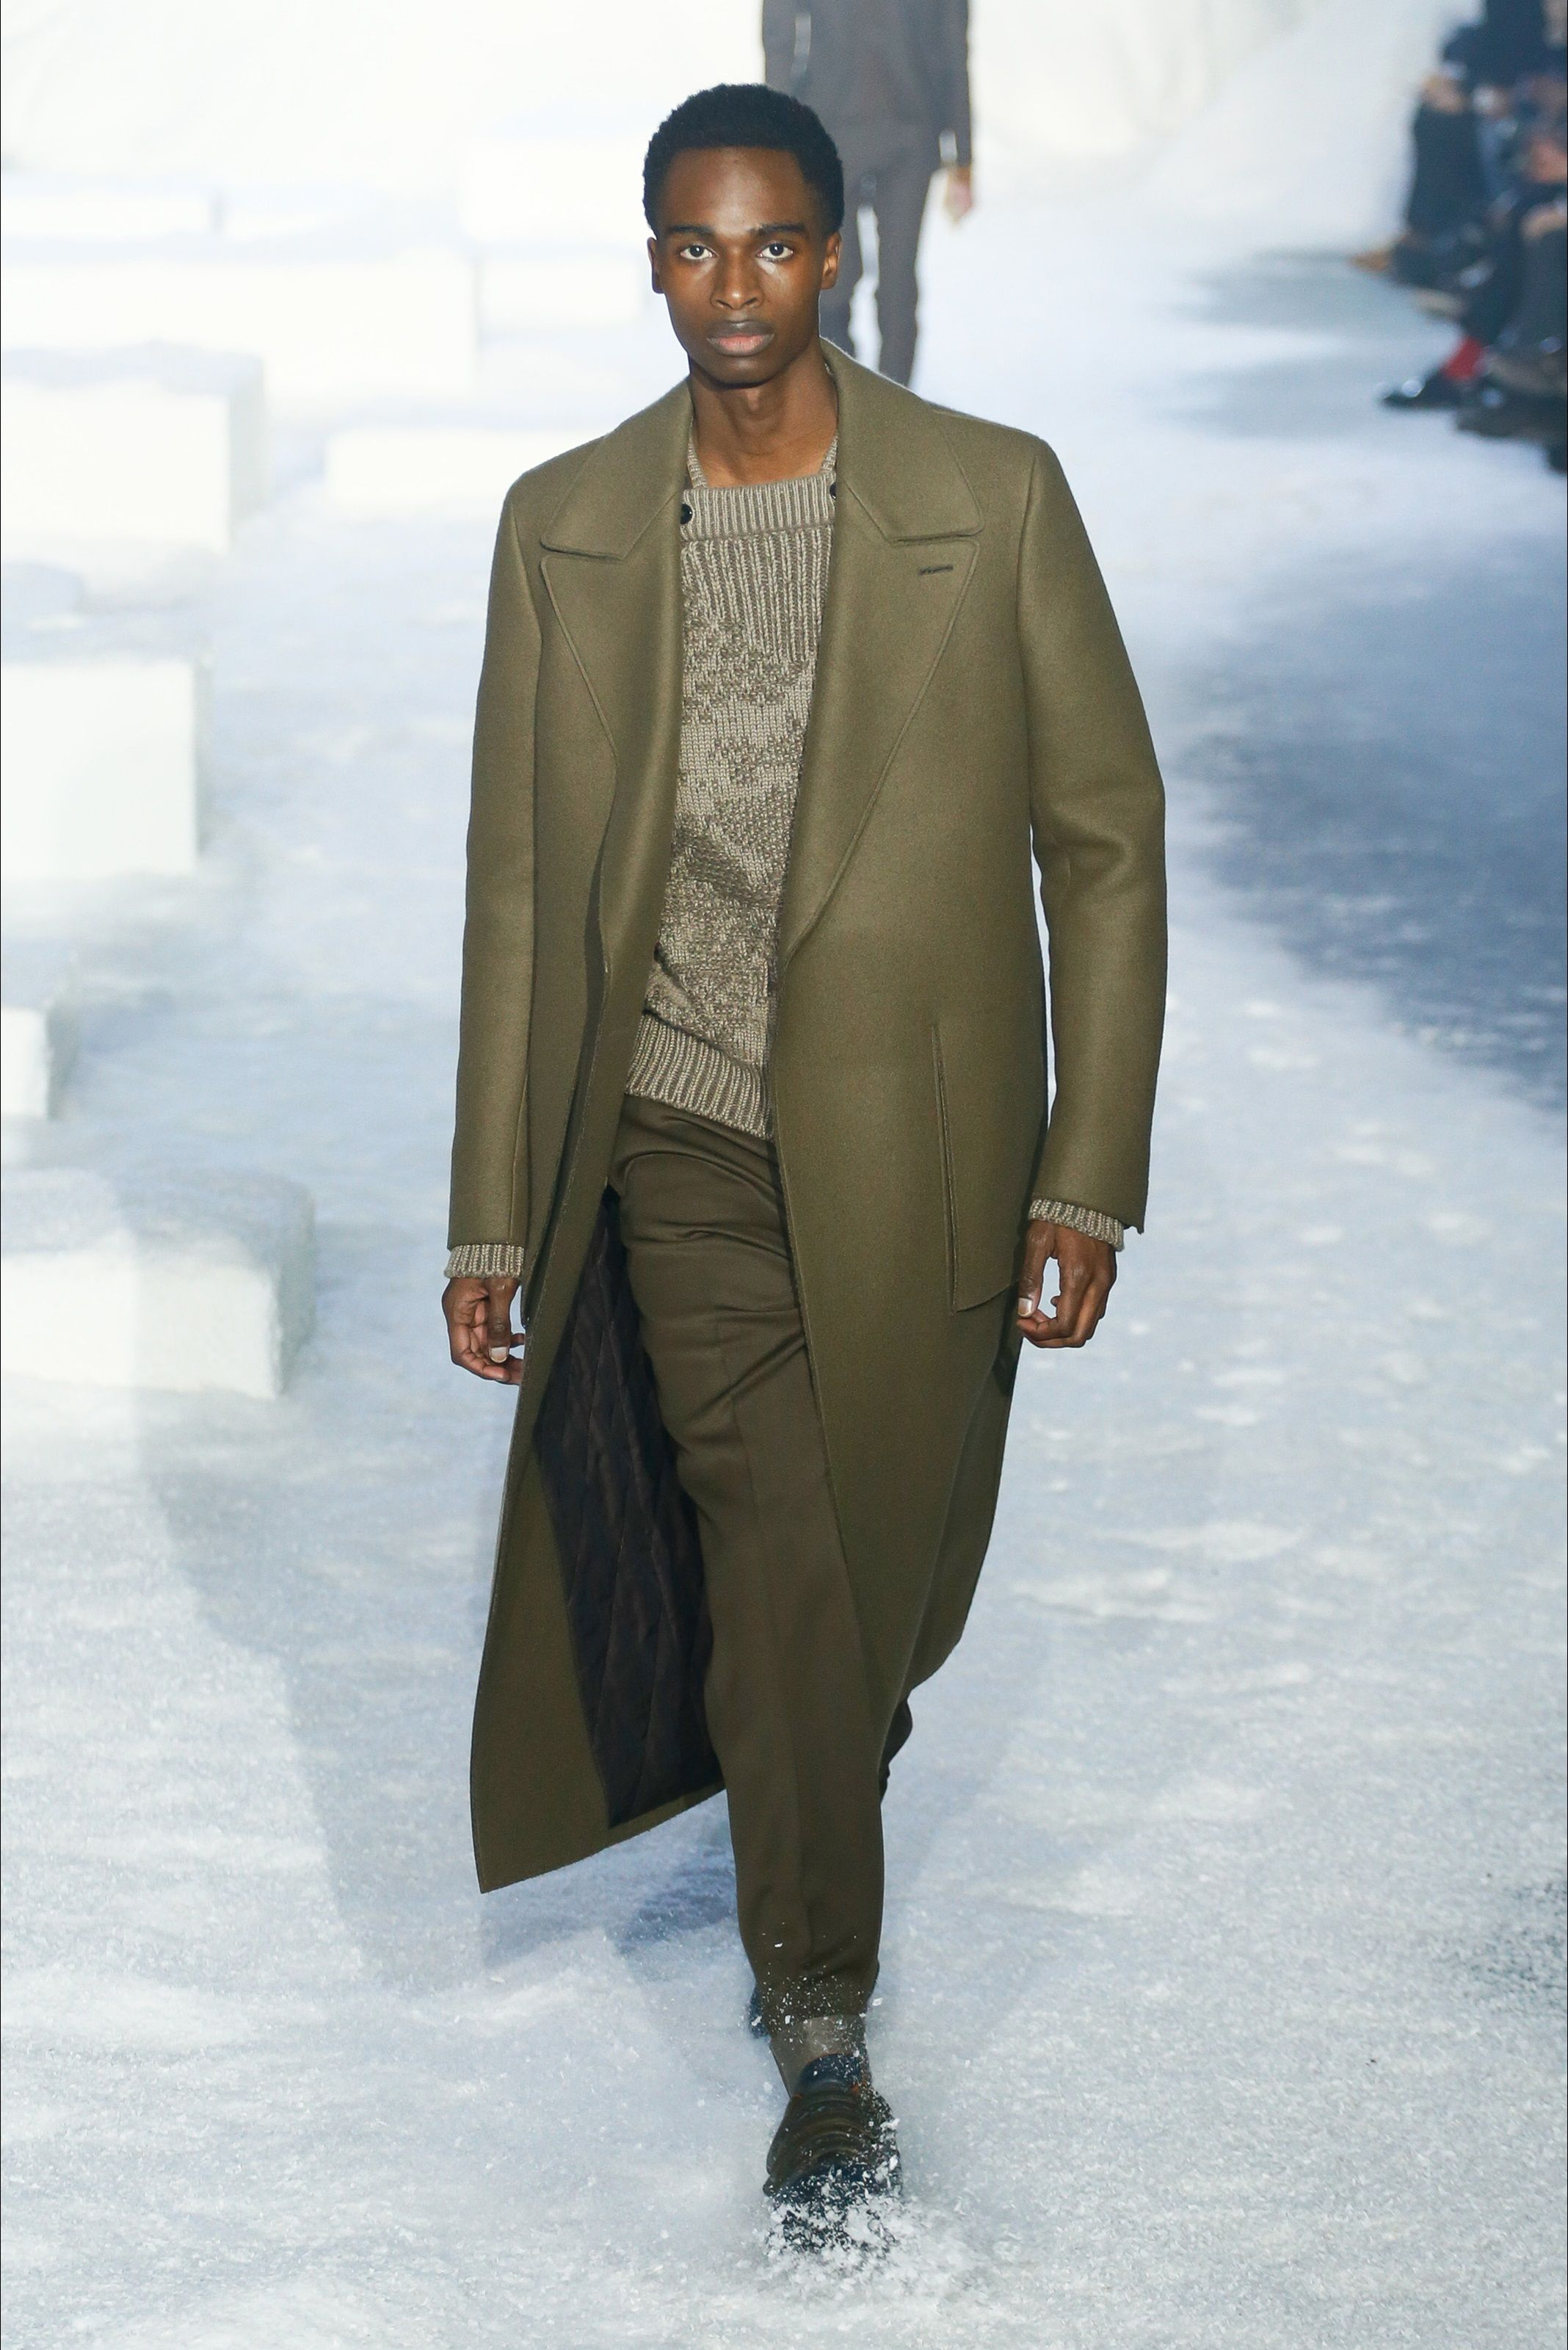 Sfilata Moda Uomo Ermenegildo Zegna Milano - Autunno Inverno 2018-19 - Vogue 452ff12d88a